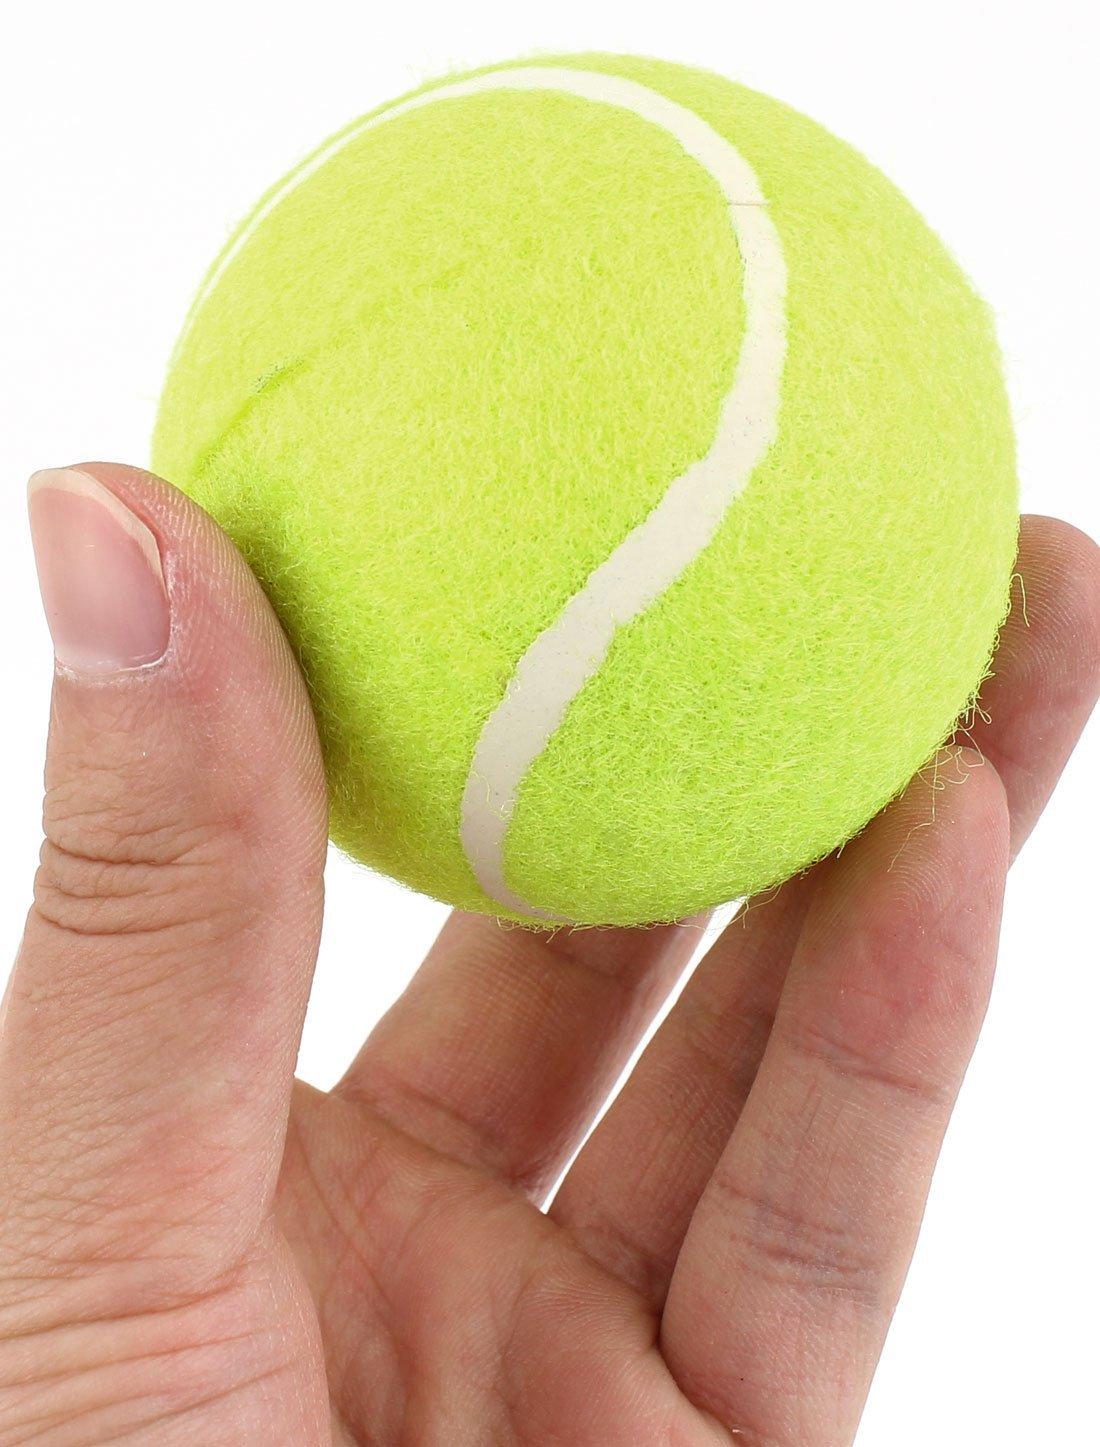 Amazon.com : eDealMax Entrenamiento Deportivo Amarillo Verde Dia 6 cm de espuma PU Pelotas de Tenis 3 piezas : Sports & Outdoors